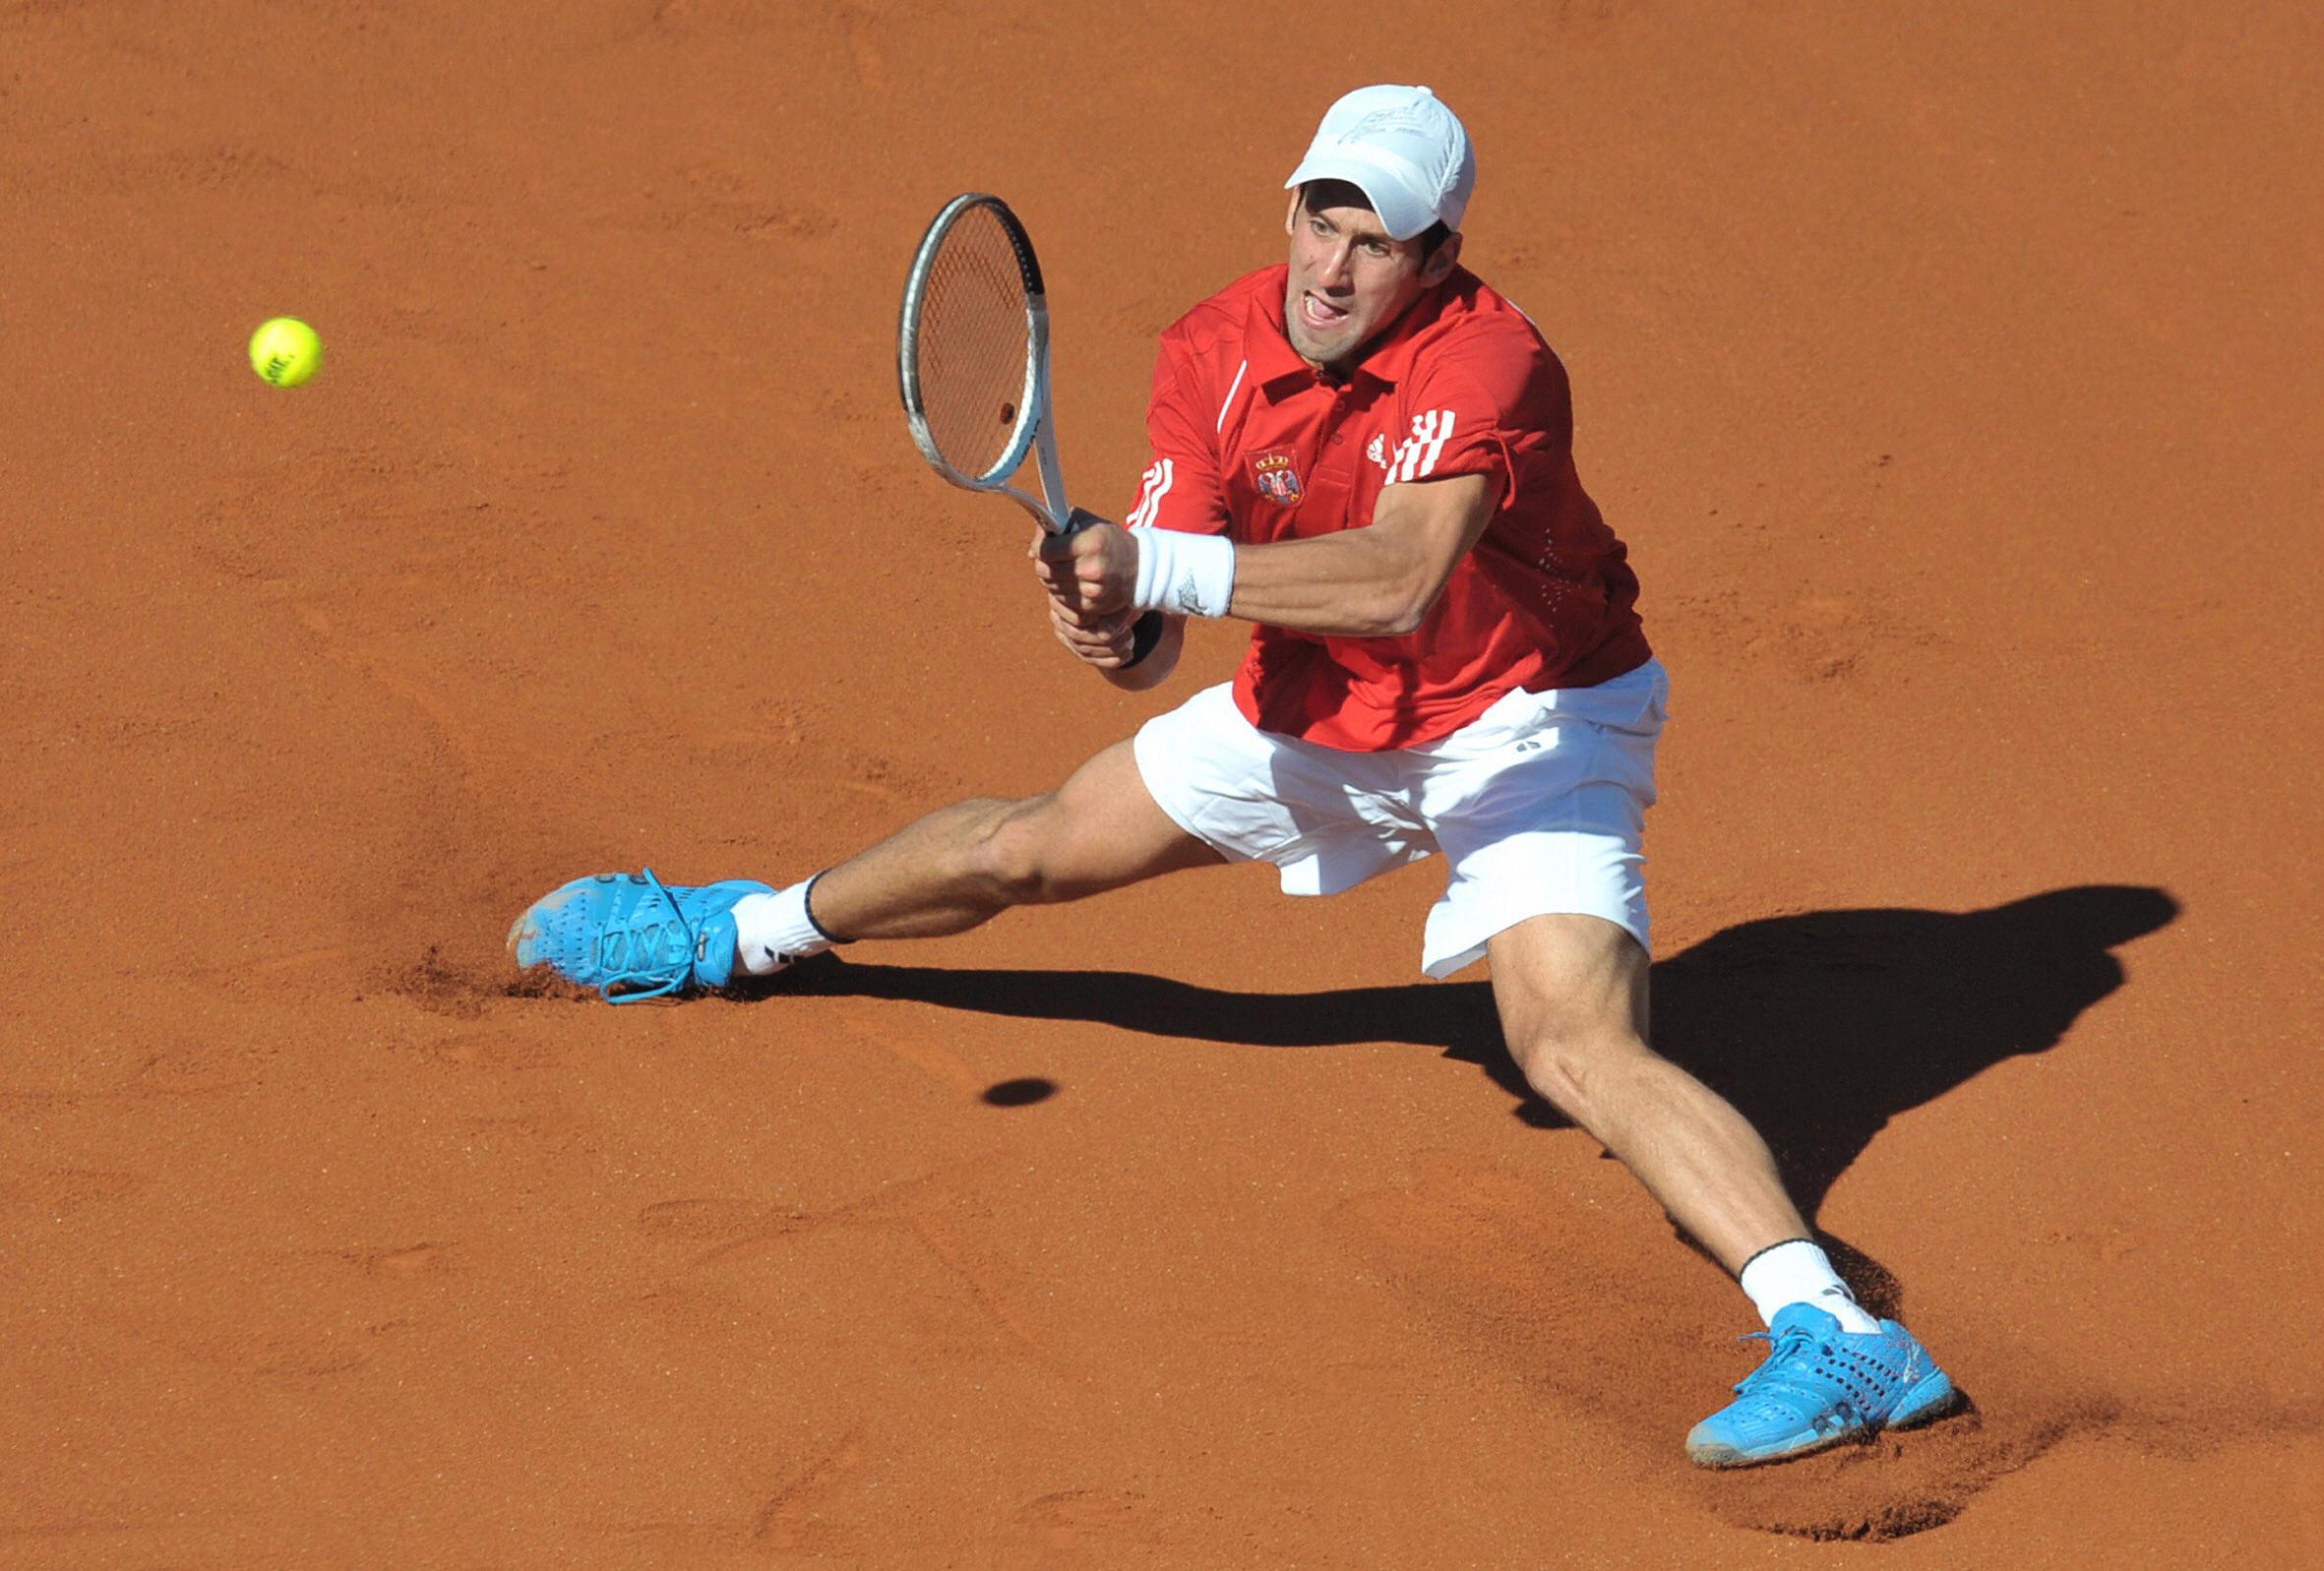 Djokovic's blue kicks were an all-time favorite...